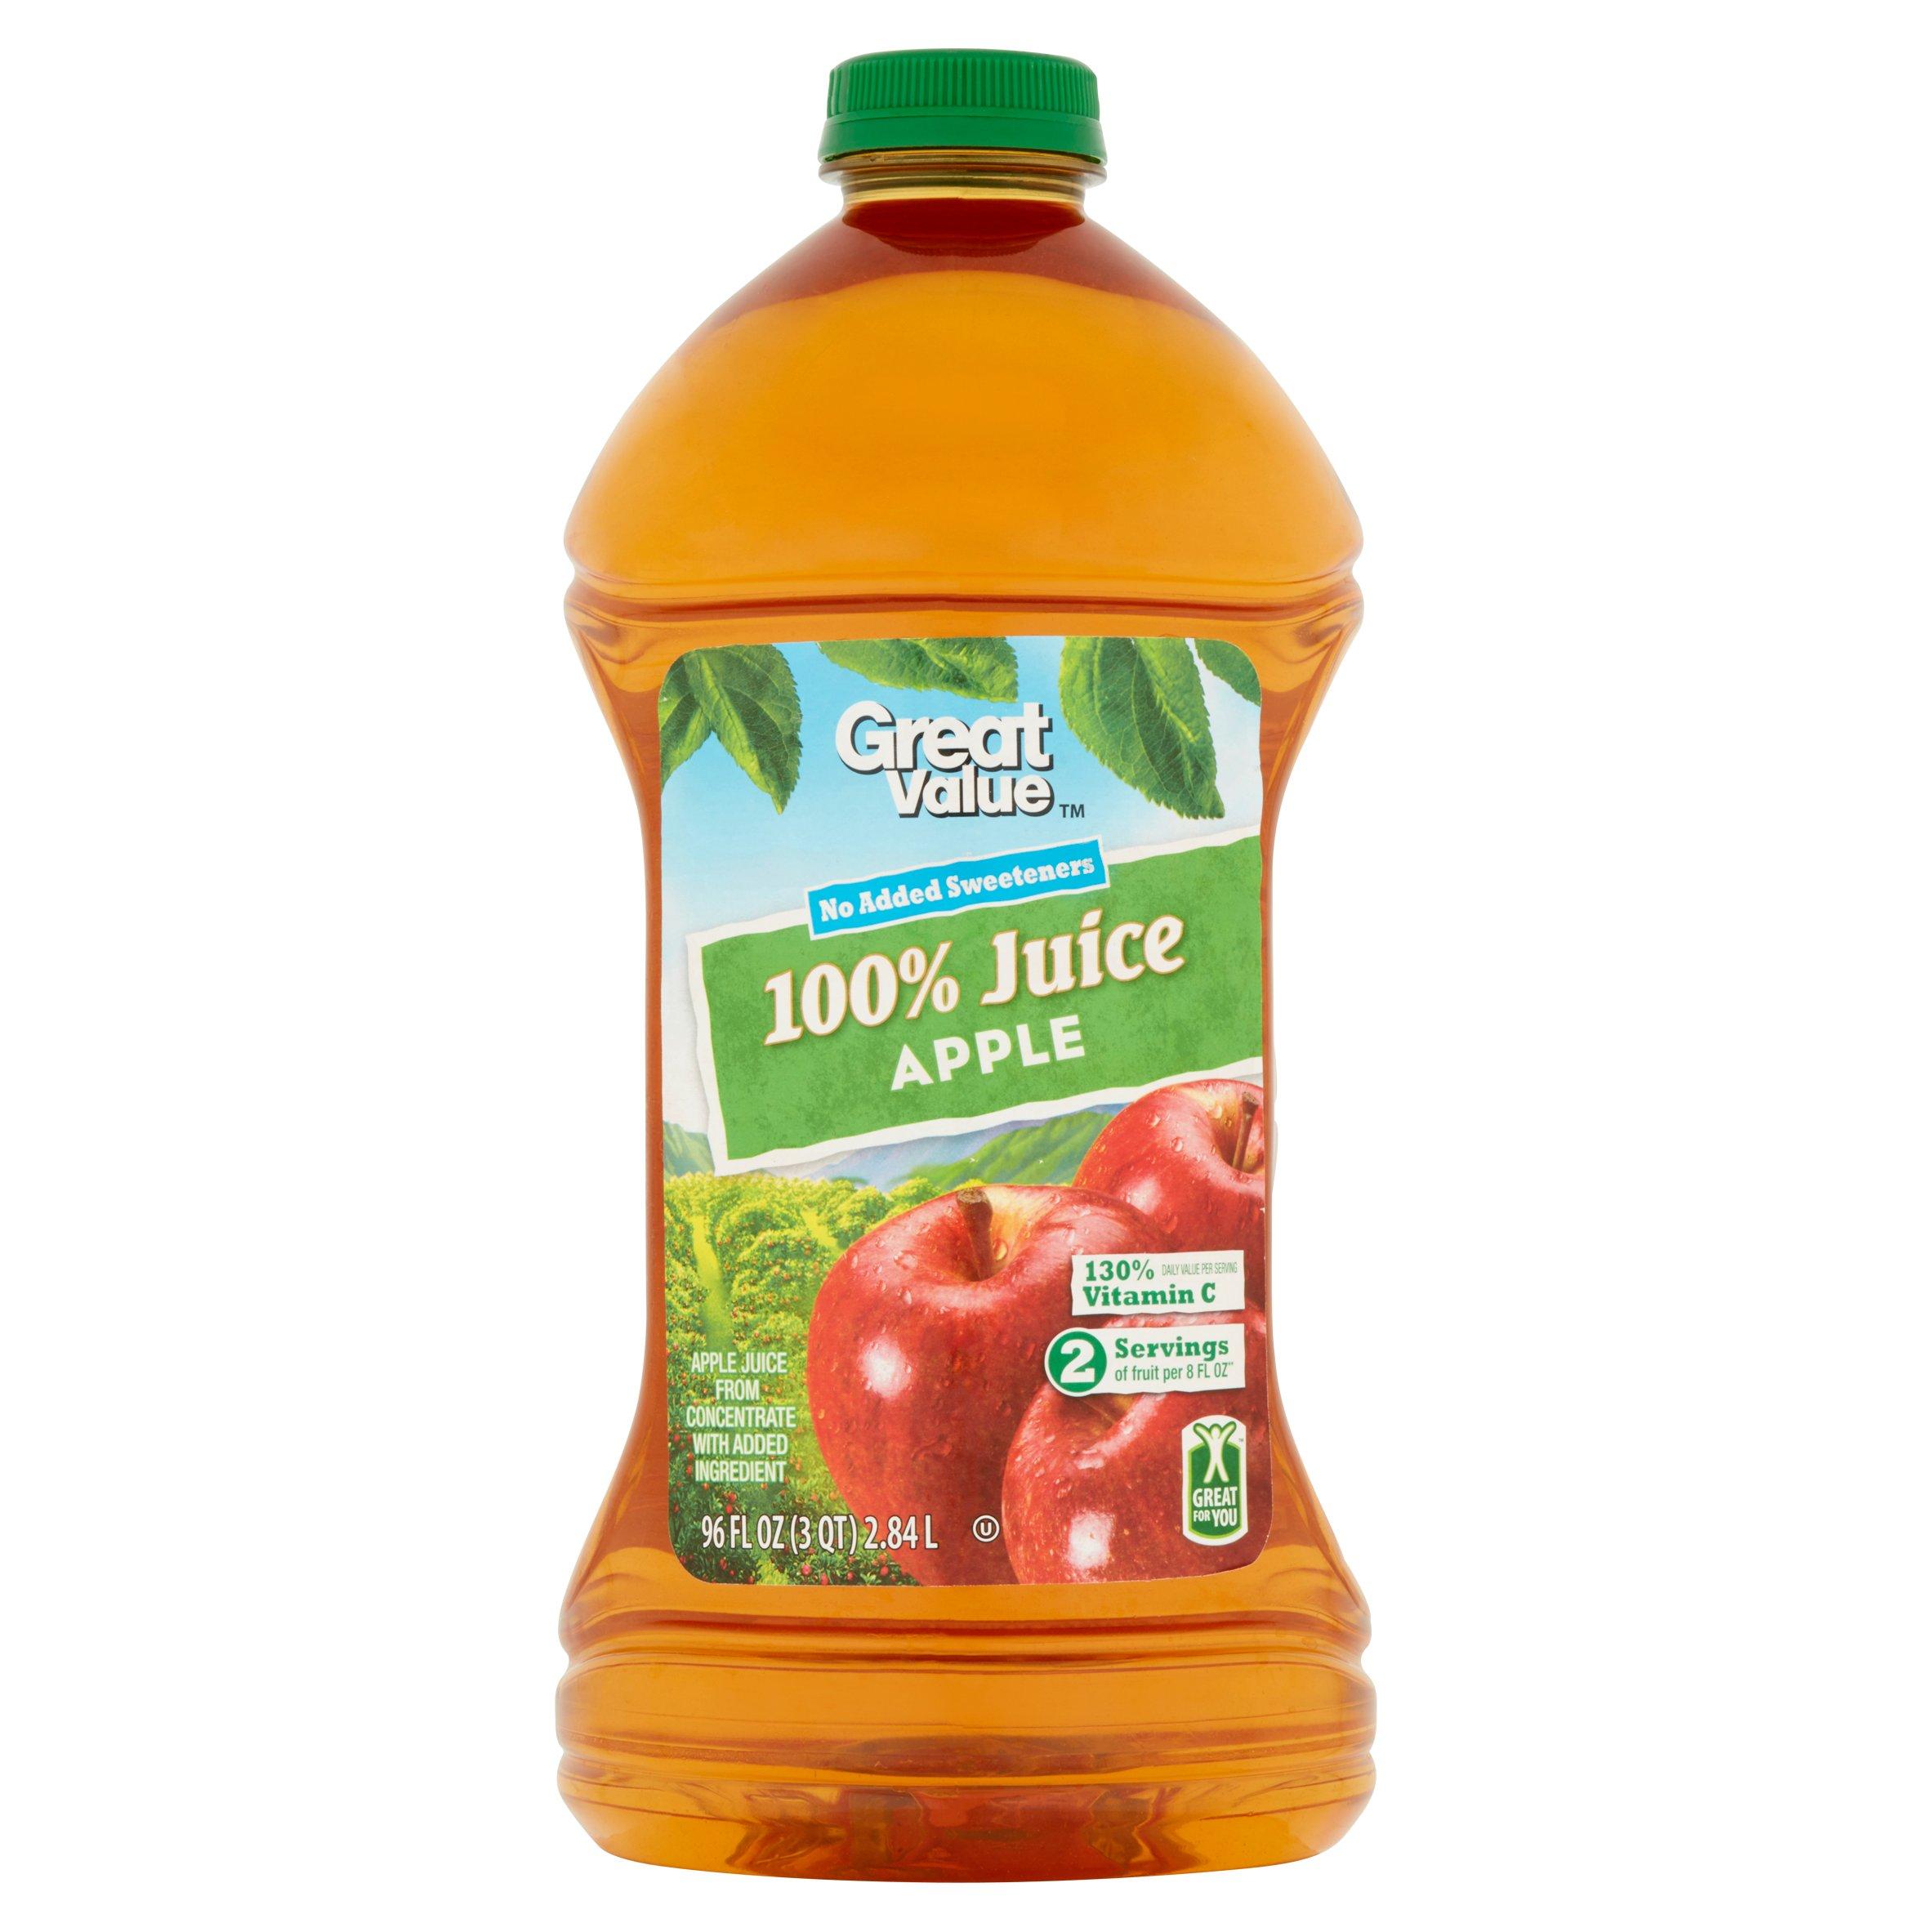 Great Value 100% Juice, Apple, 96 Fl Oz, 1 Count